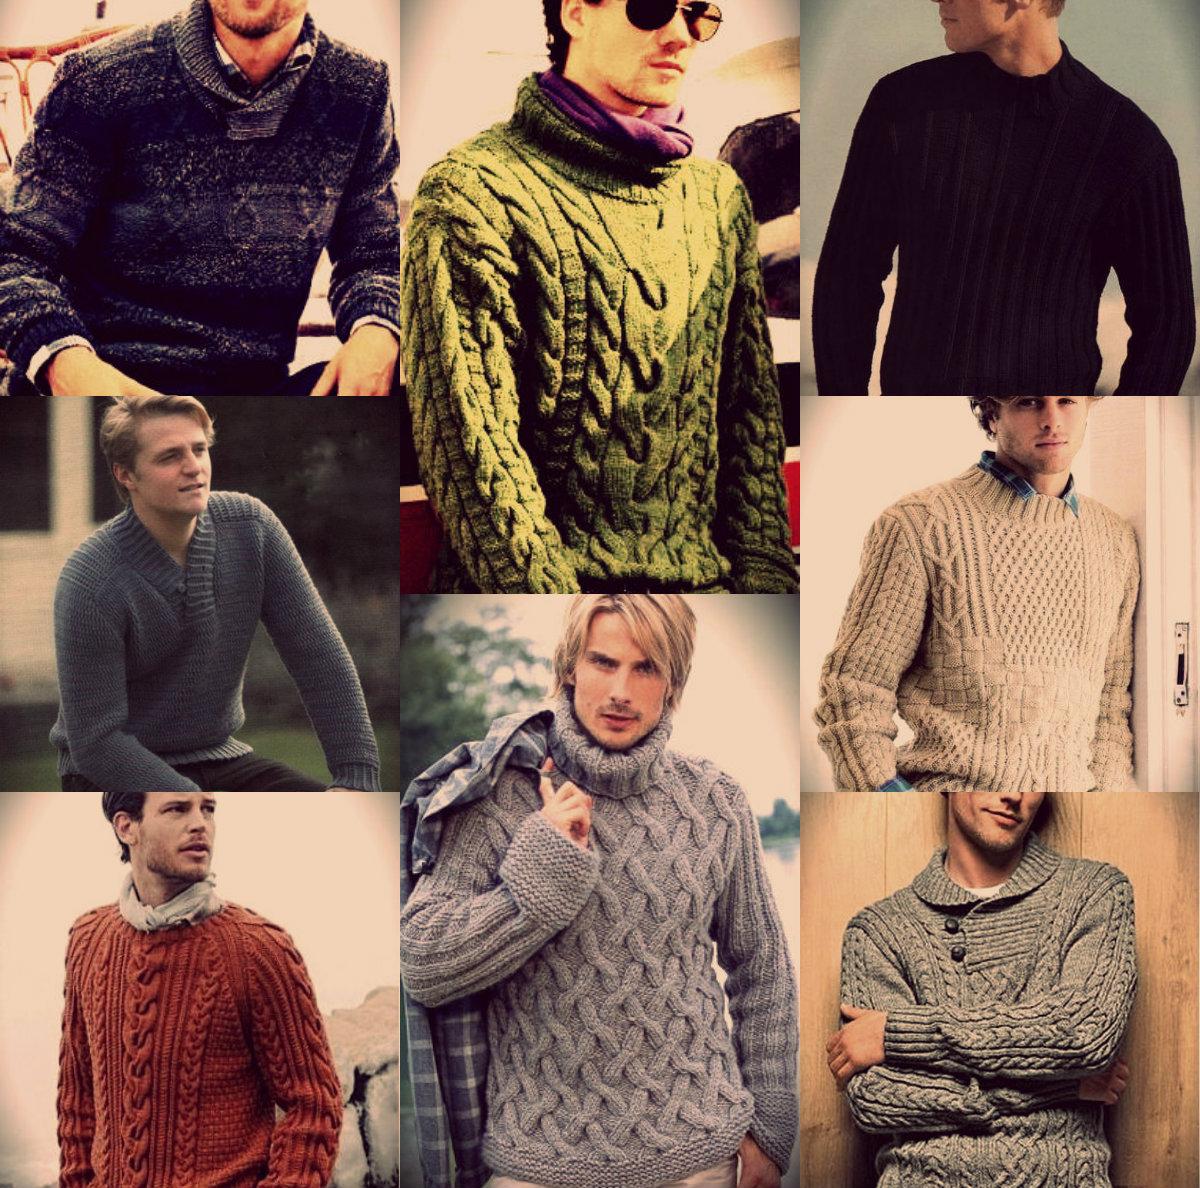 vjazanie-dlja-muzhchin-pulovery-spicami